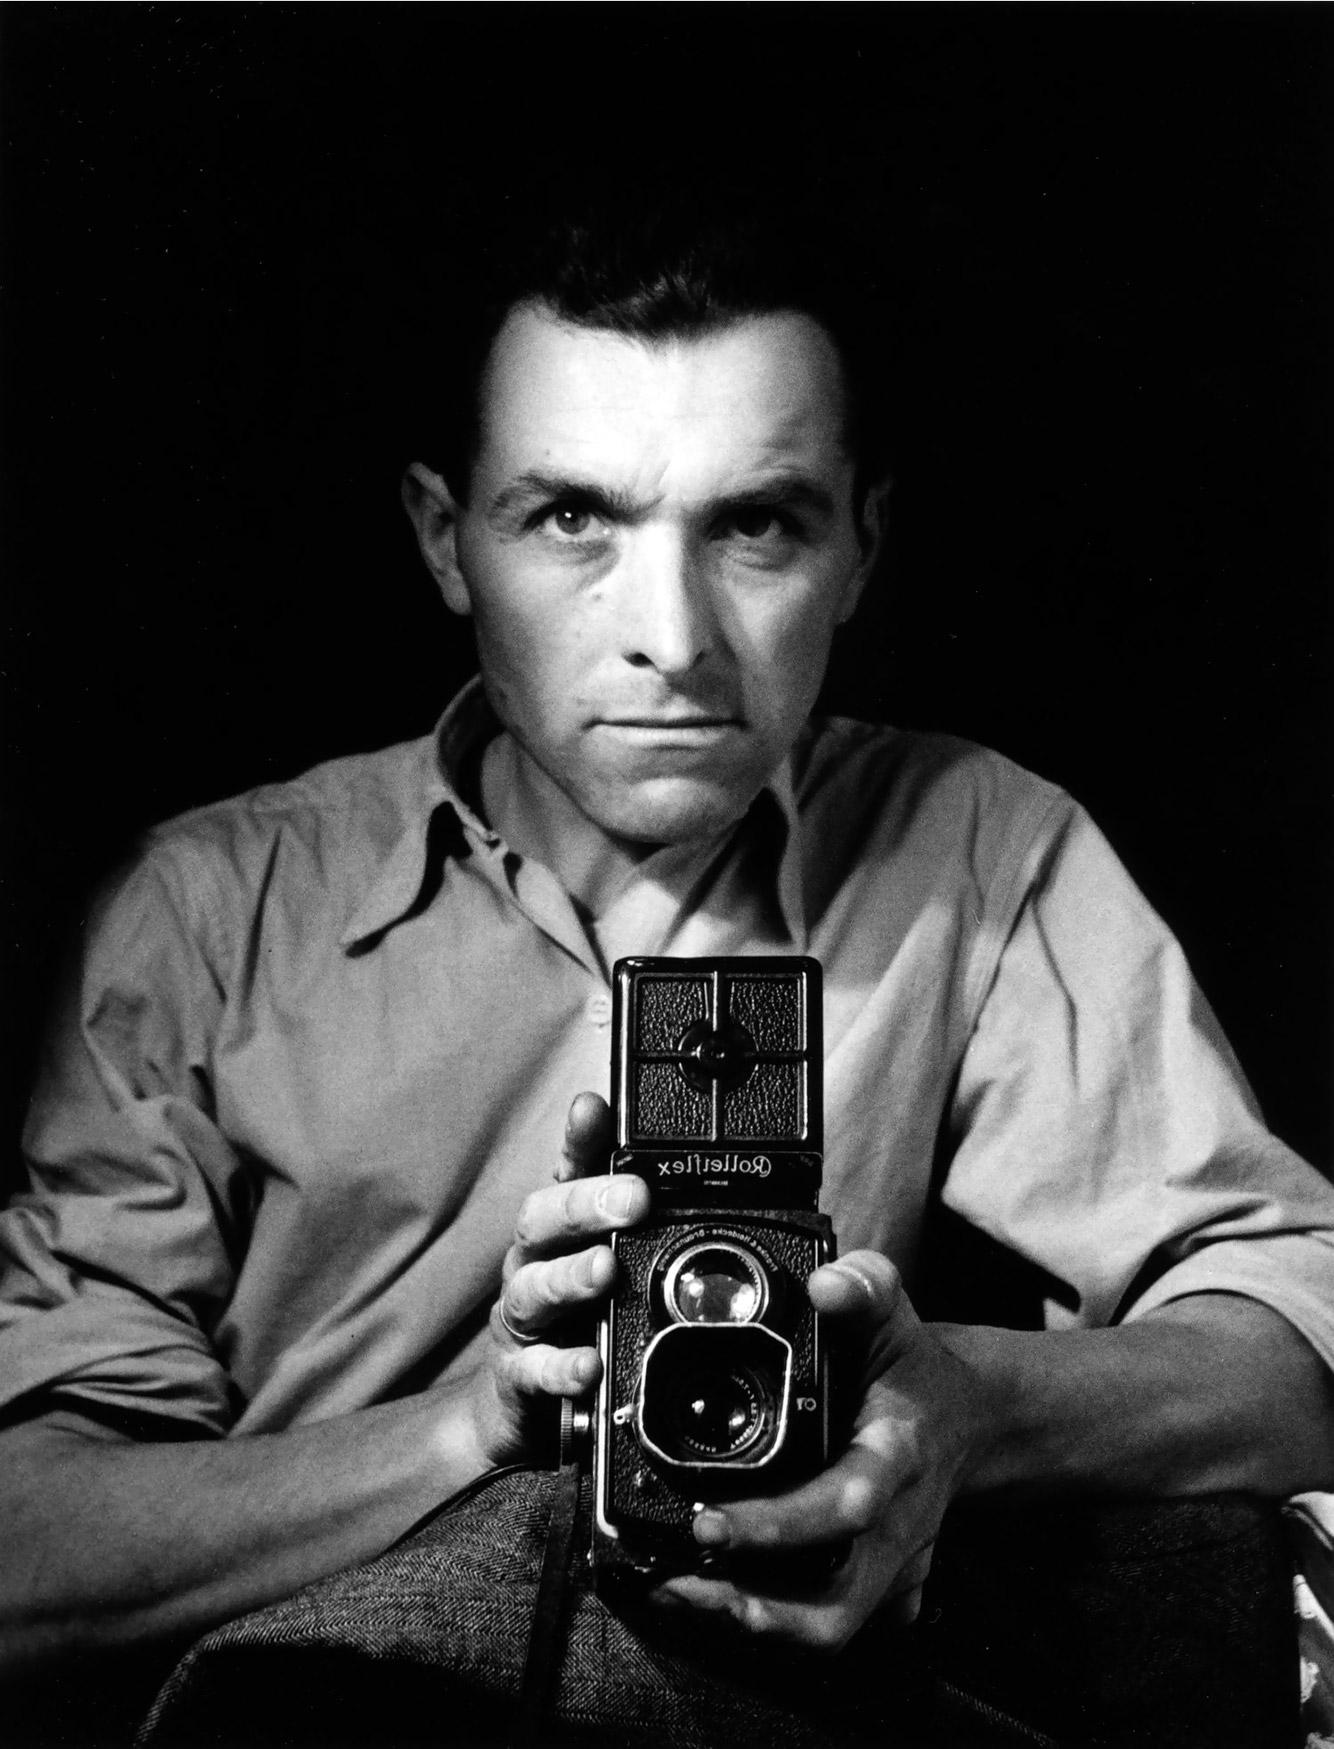 robert-doisneau-autoportretas-su-rolleiflex-1947